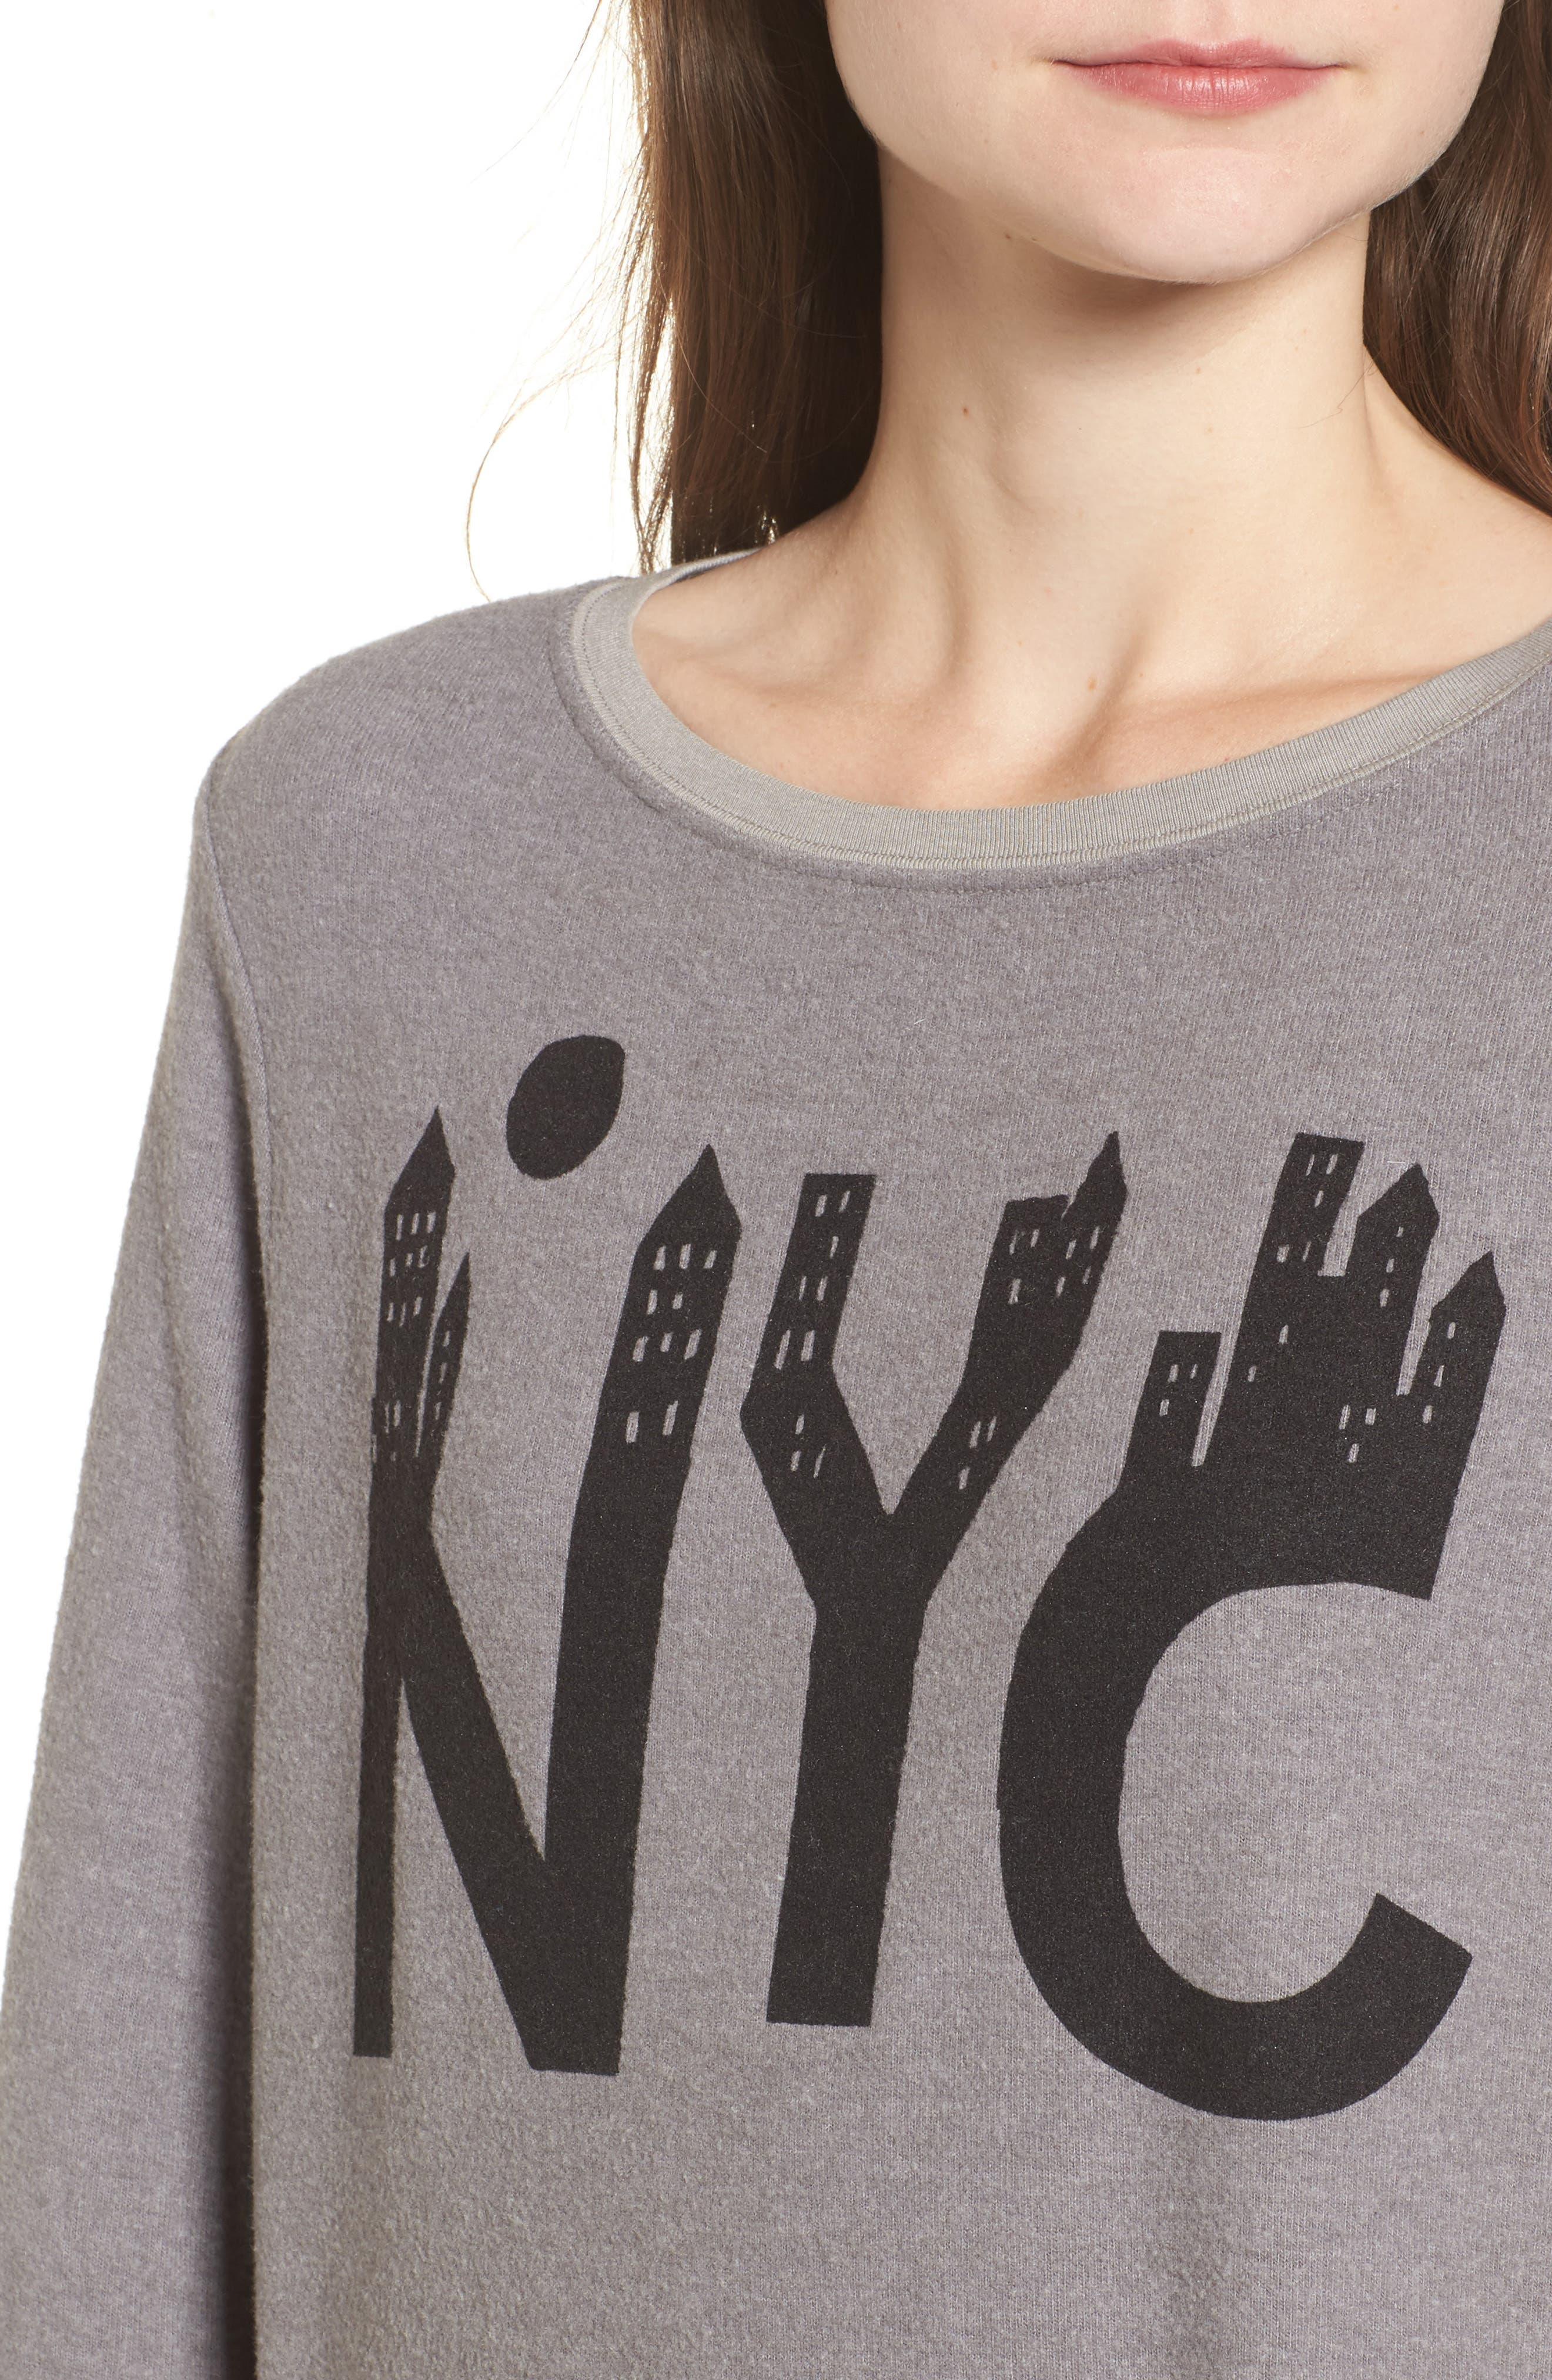 NYC Sweatshirt,                             Alternate thumbnail 4, color,                             Vintage Grey